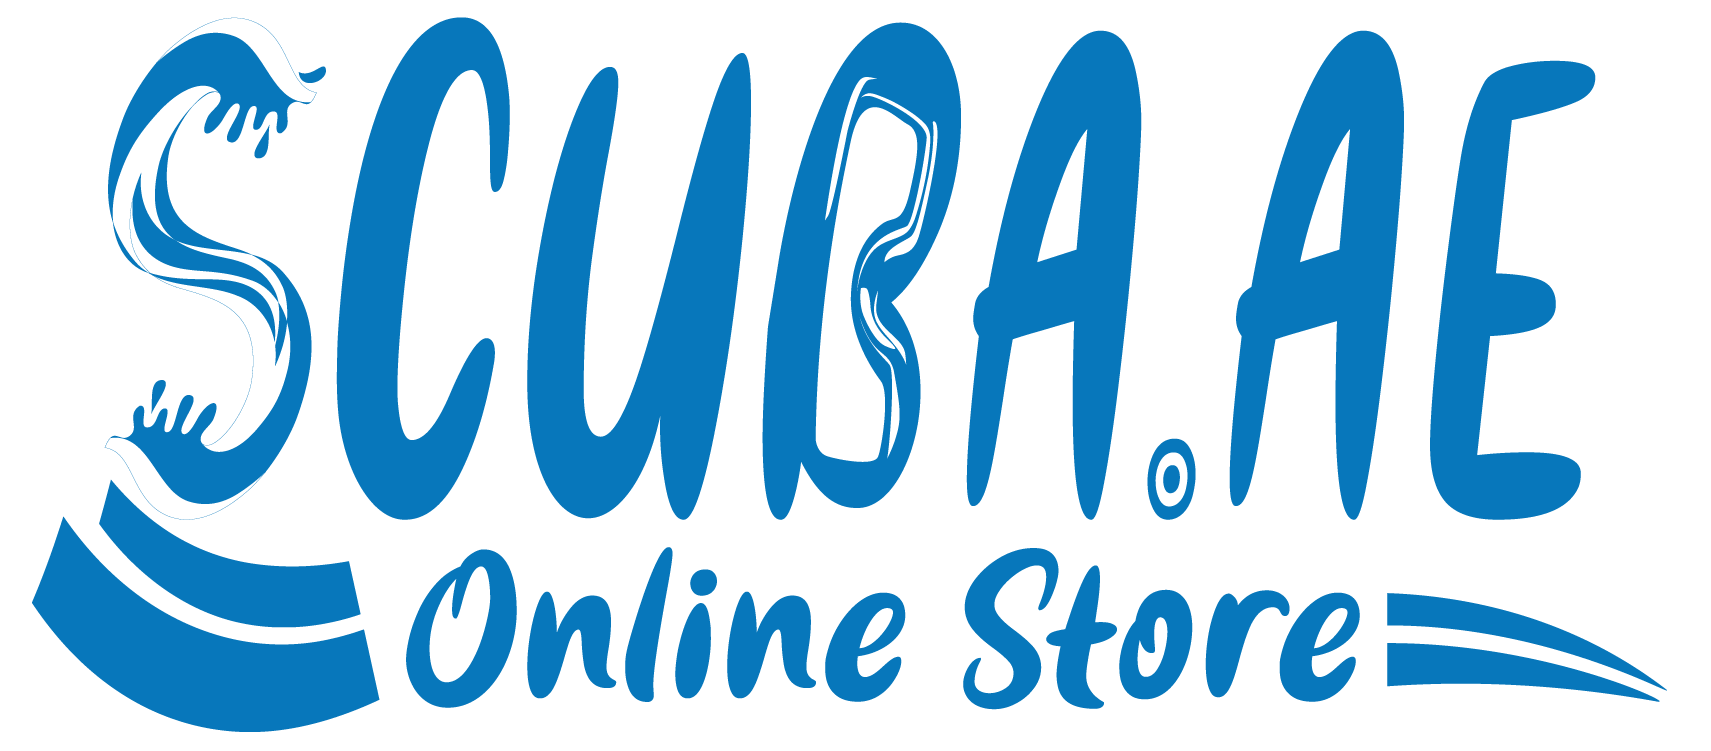 Scuba Store